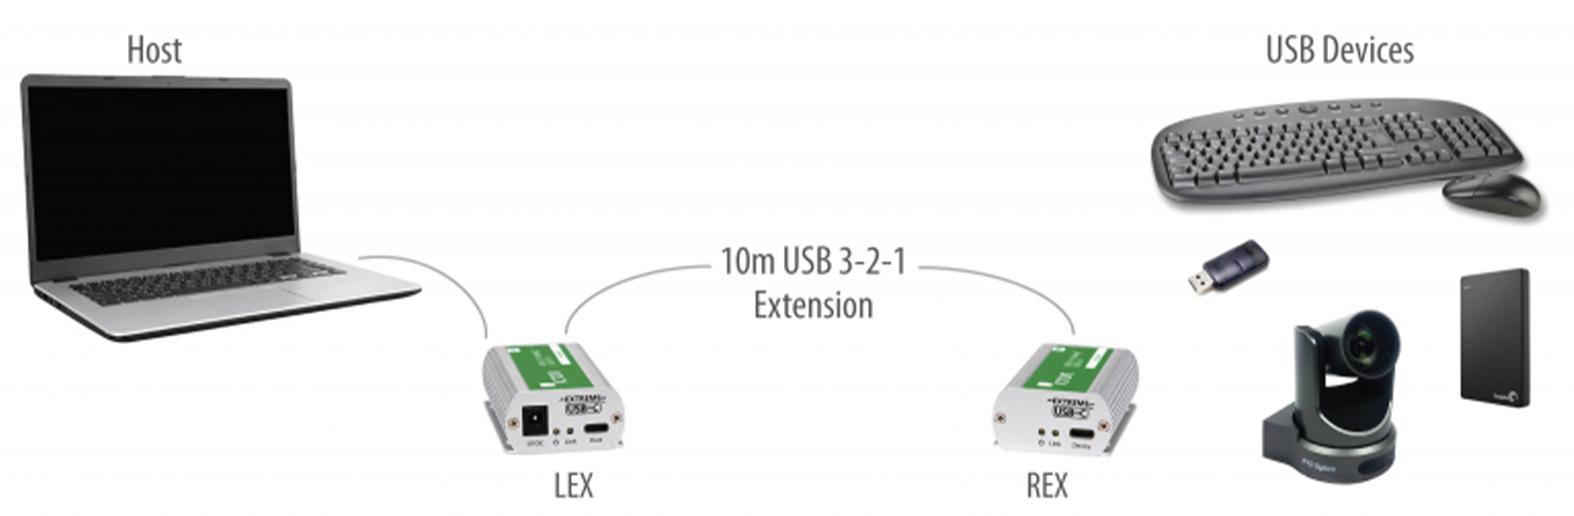 Icron USB 3-2-1 Starling 3251 Application Diagram